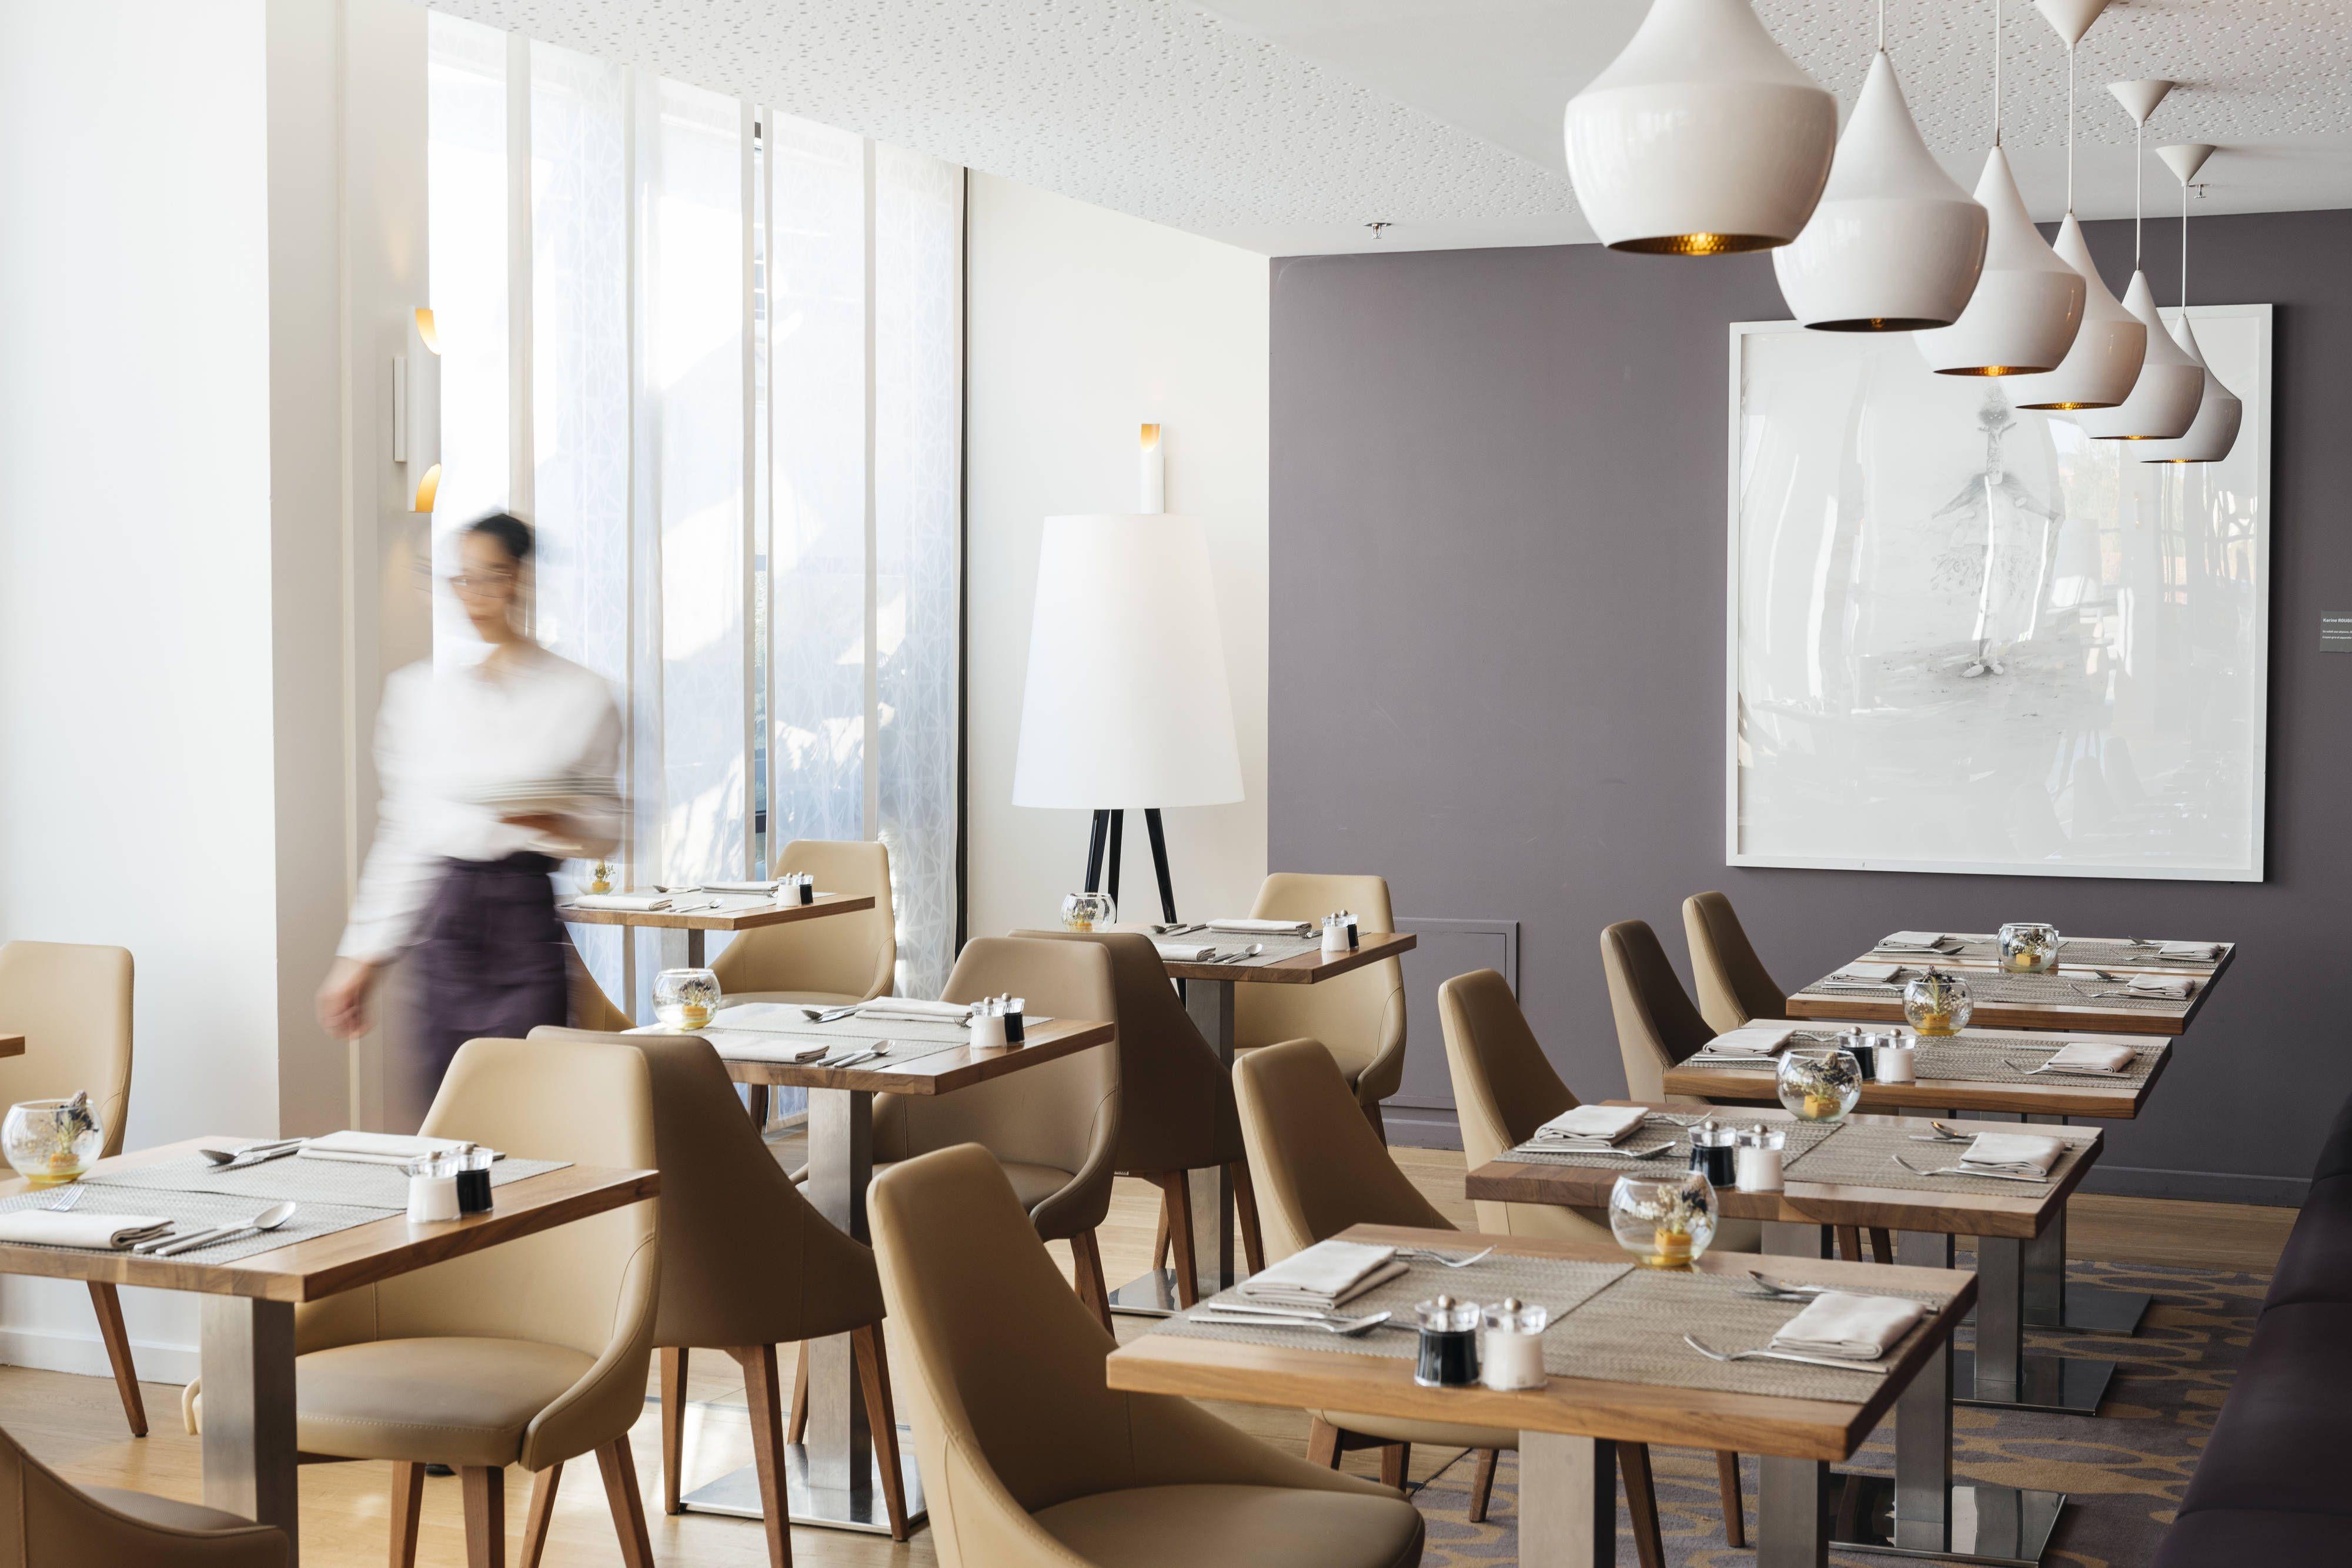 Renaissance Aix En Provence Hotel Le Comptoir Du Clos Restaurant #Holiday, #